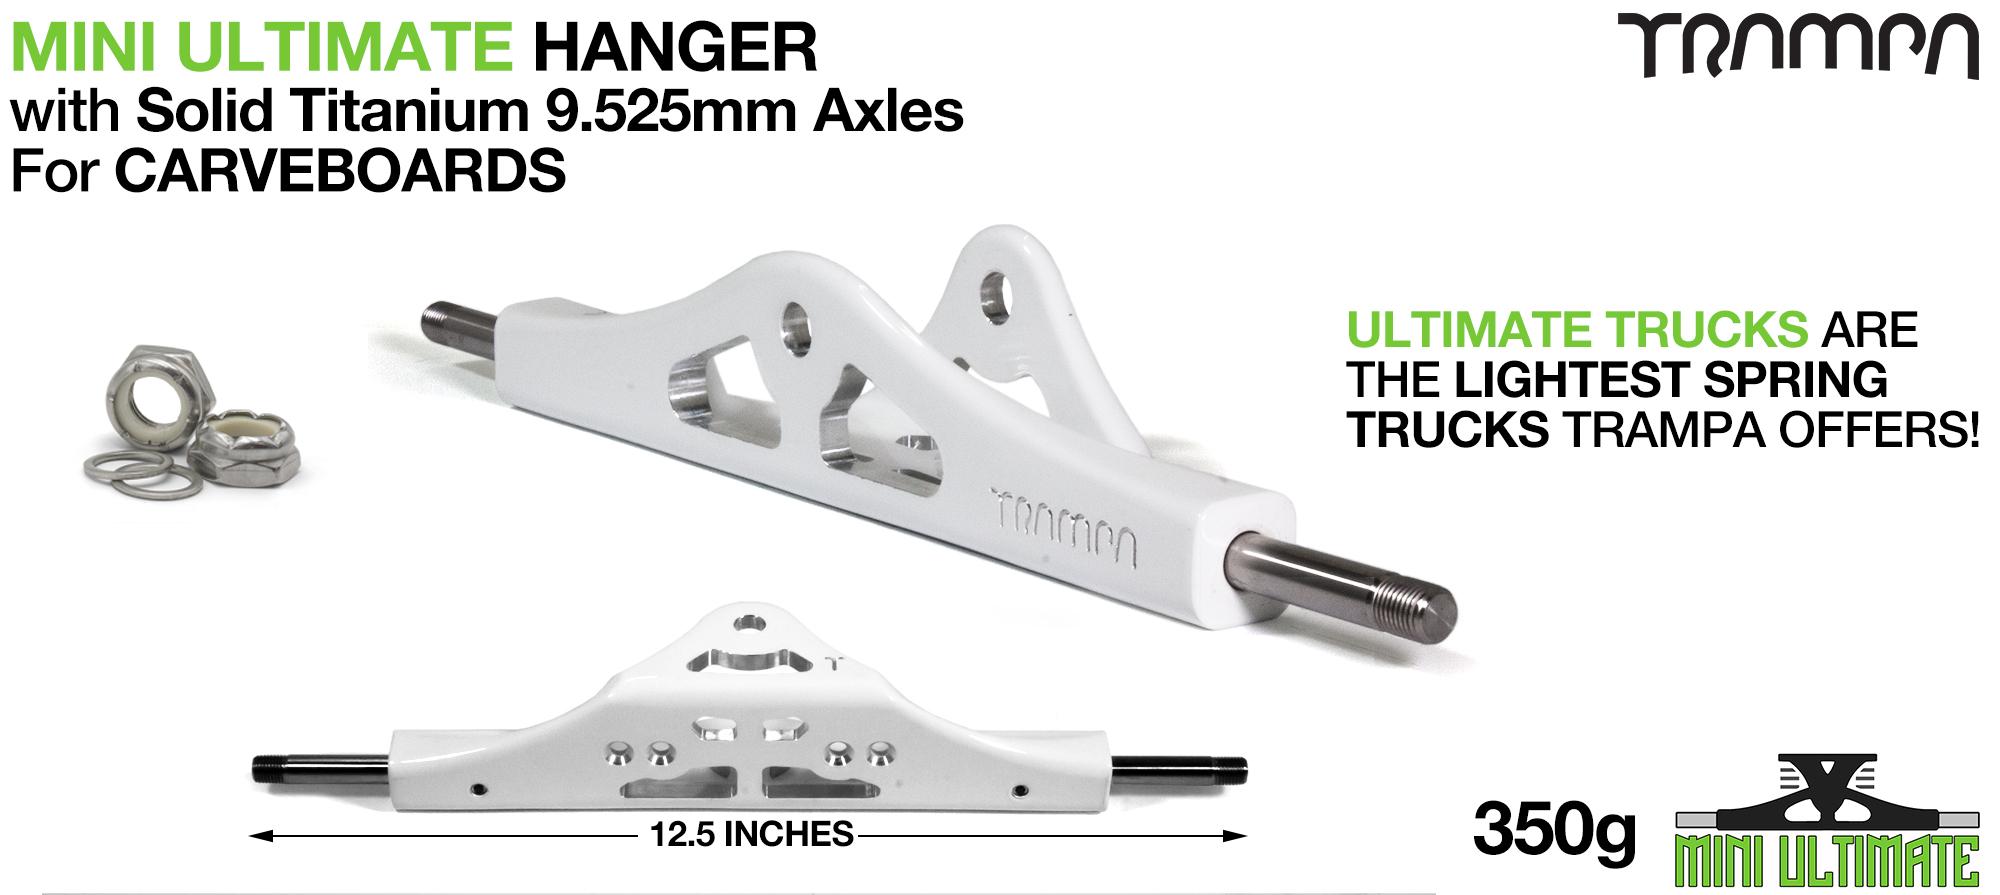 ULTIMATE MINI Hanger - 9.525mm TITANIUM Axles, Powder Coated White & CNC'd light